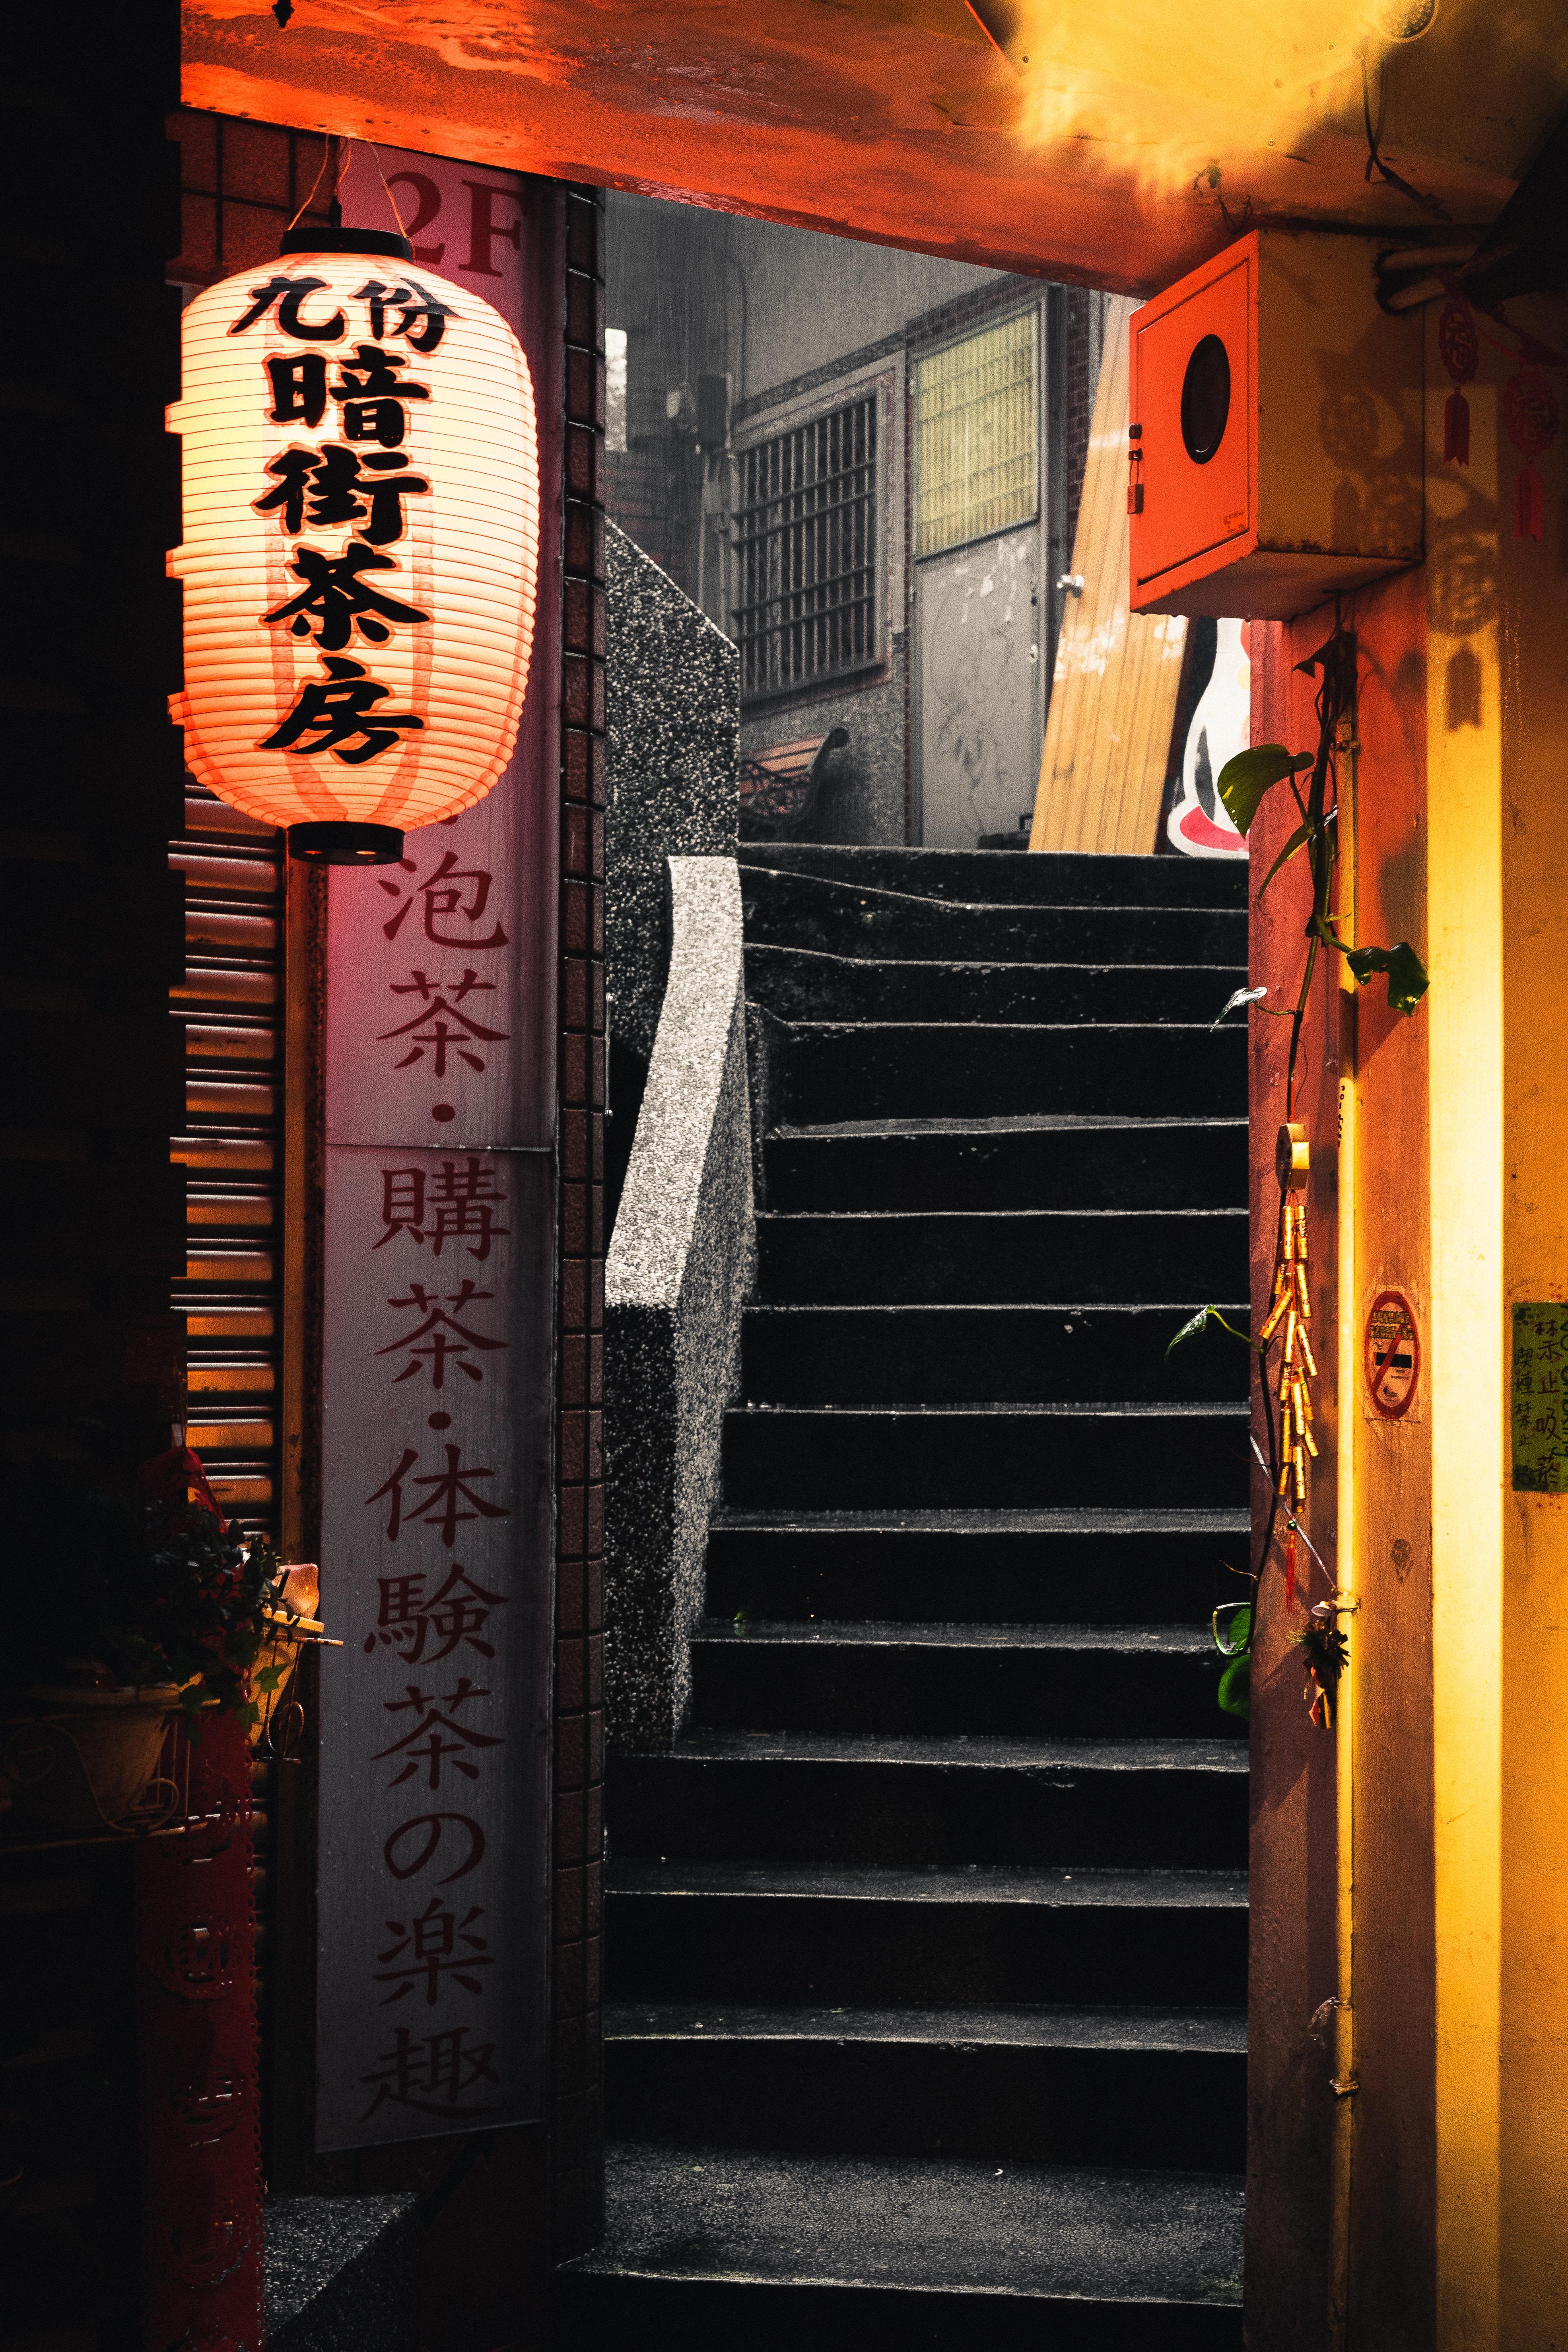 Wallpaper Chinatown Asia Neon Stairs Lamp Taiwan